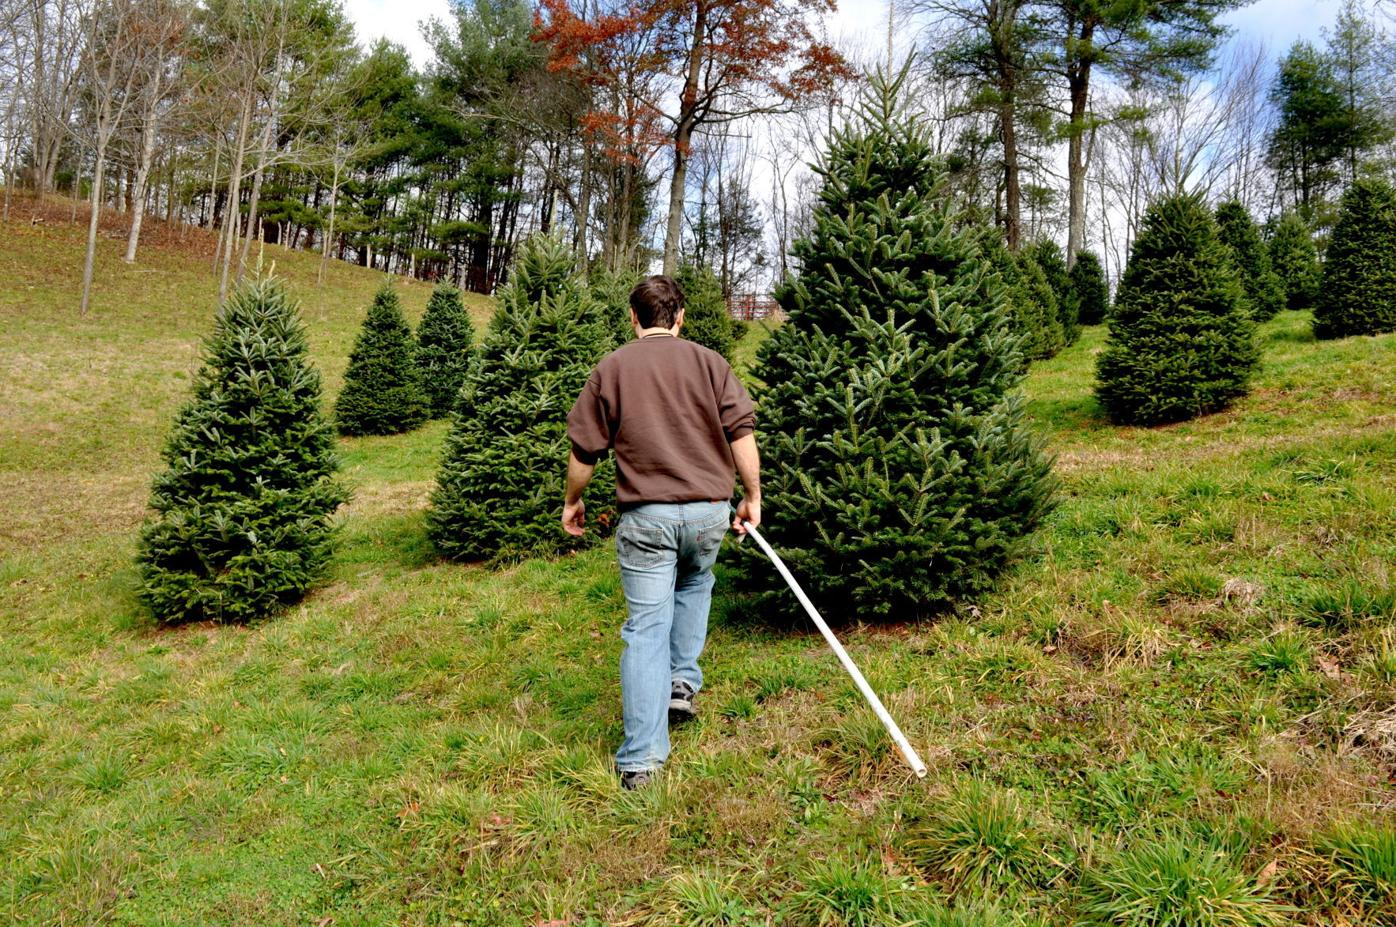 Christmas Trees 2021 Watauga Democrat Take A Tour Down On The Farm Hcnc Wataugademocrat Com